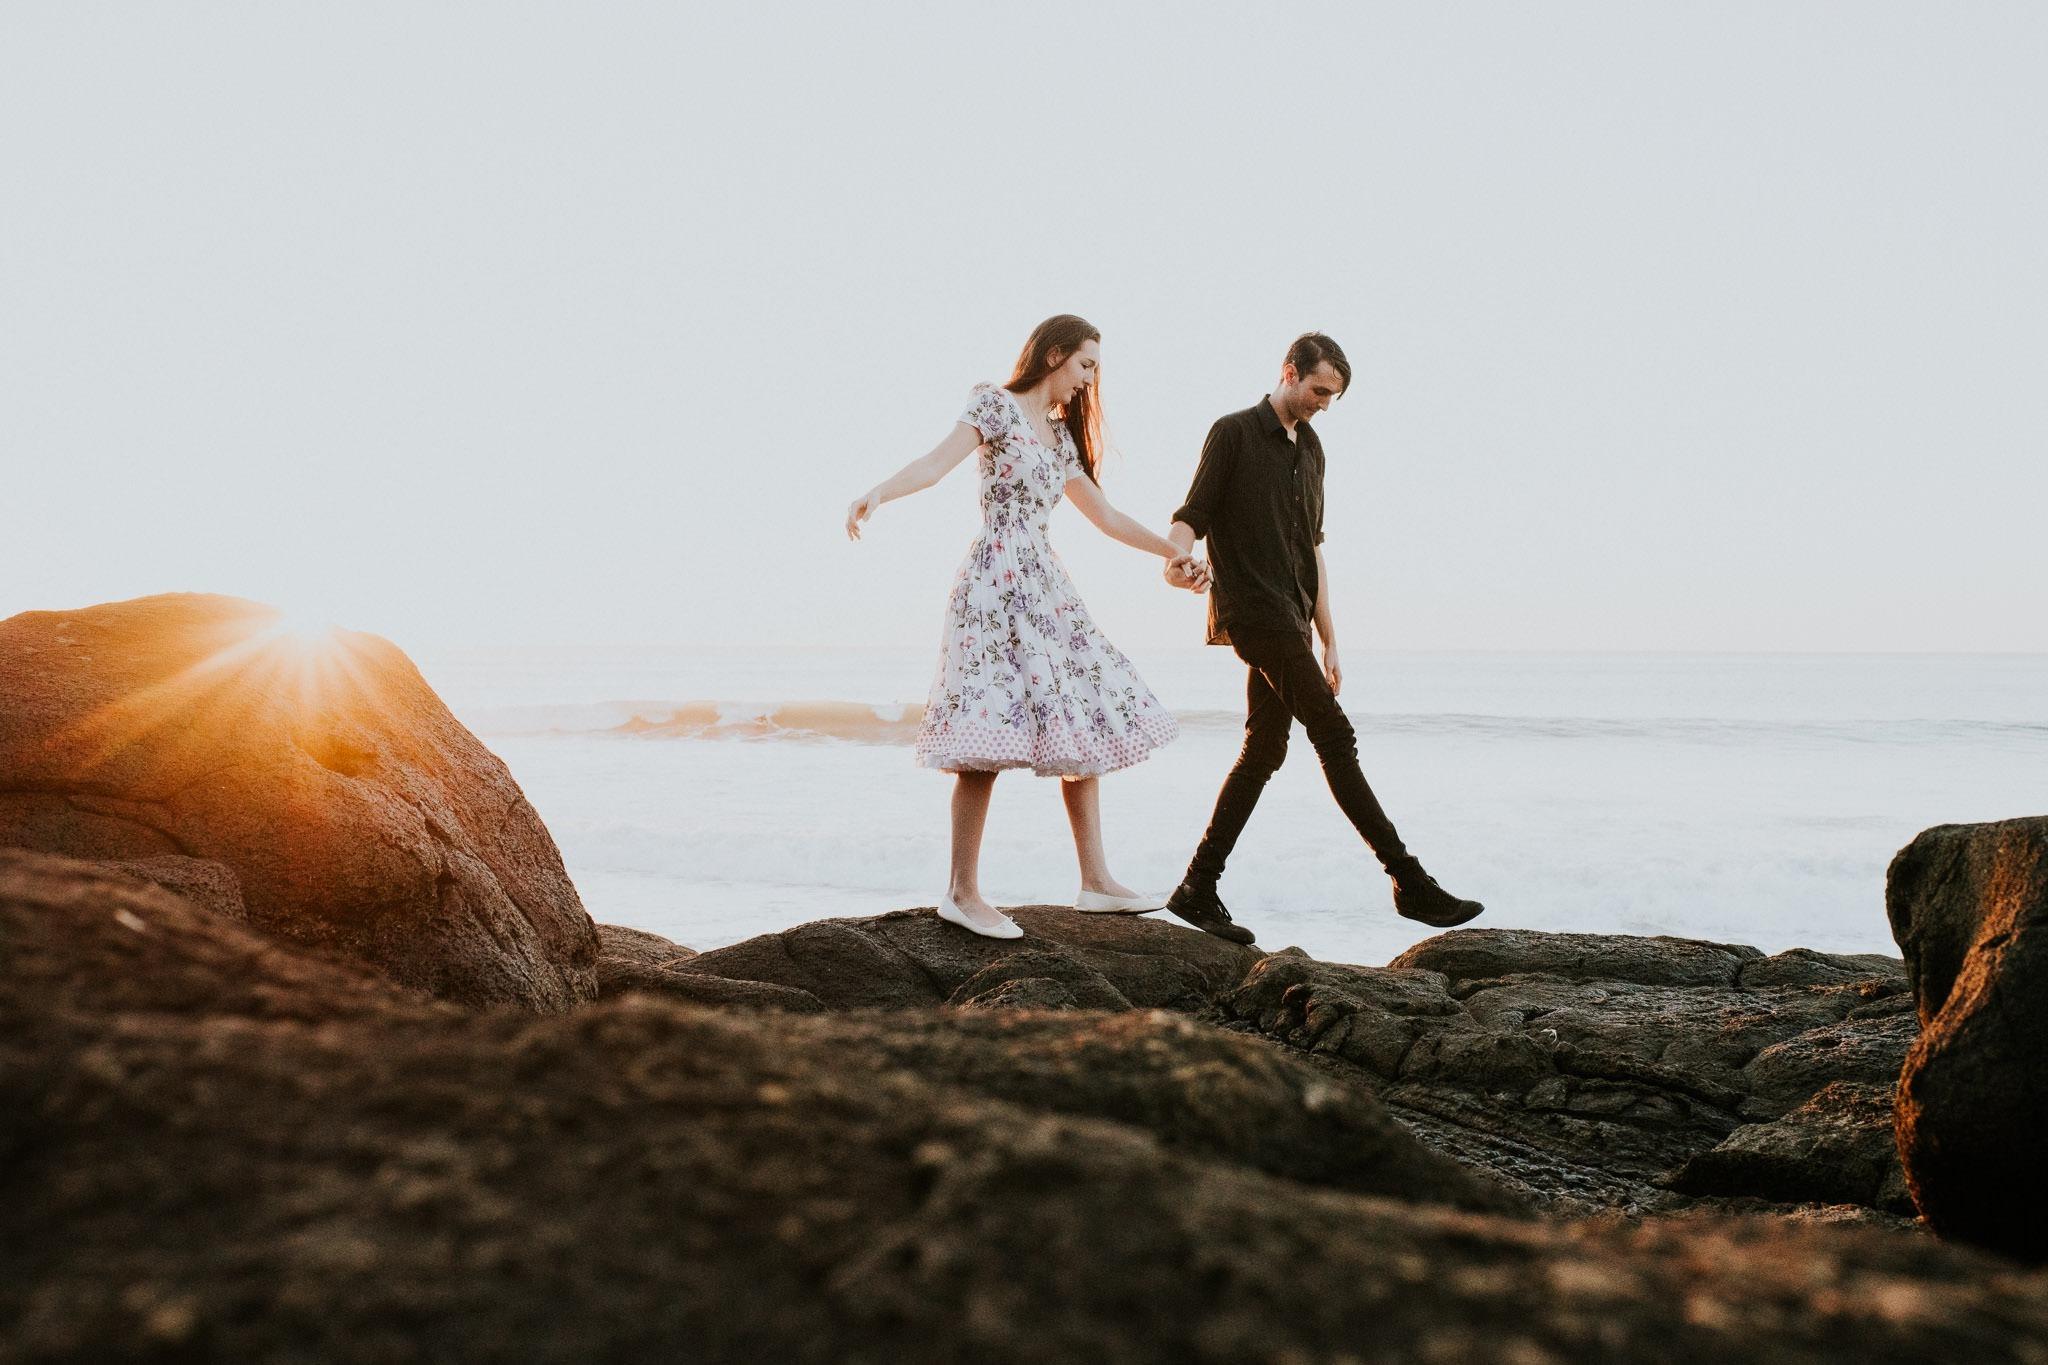 wedding photographer hamilton new zealand 1011 4